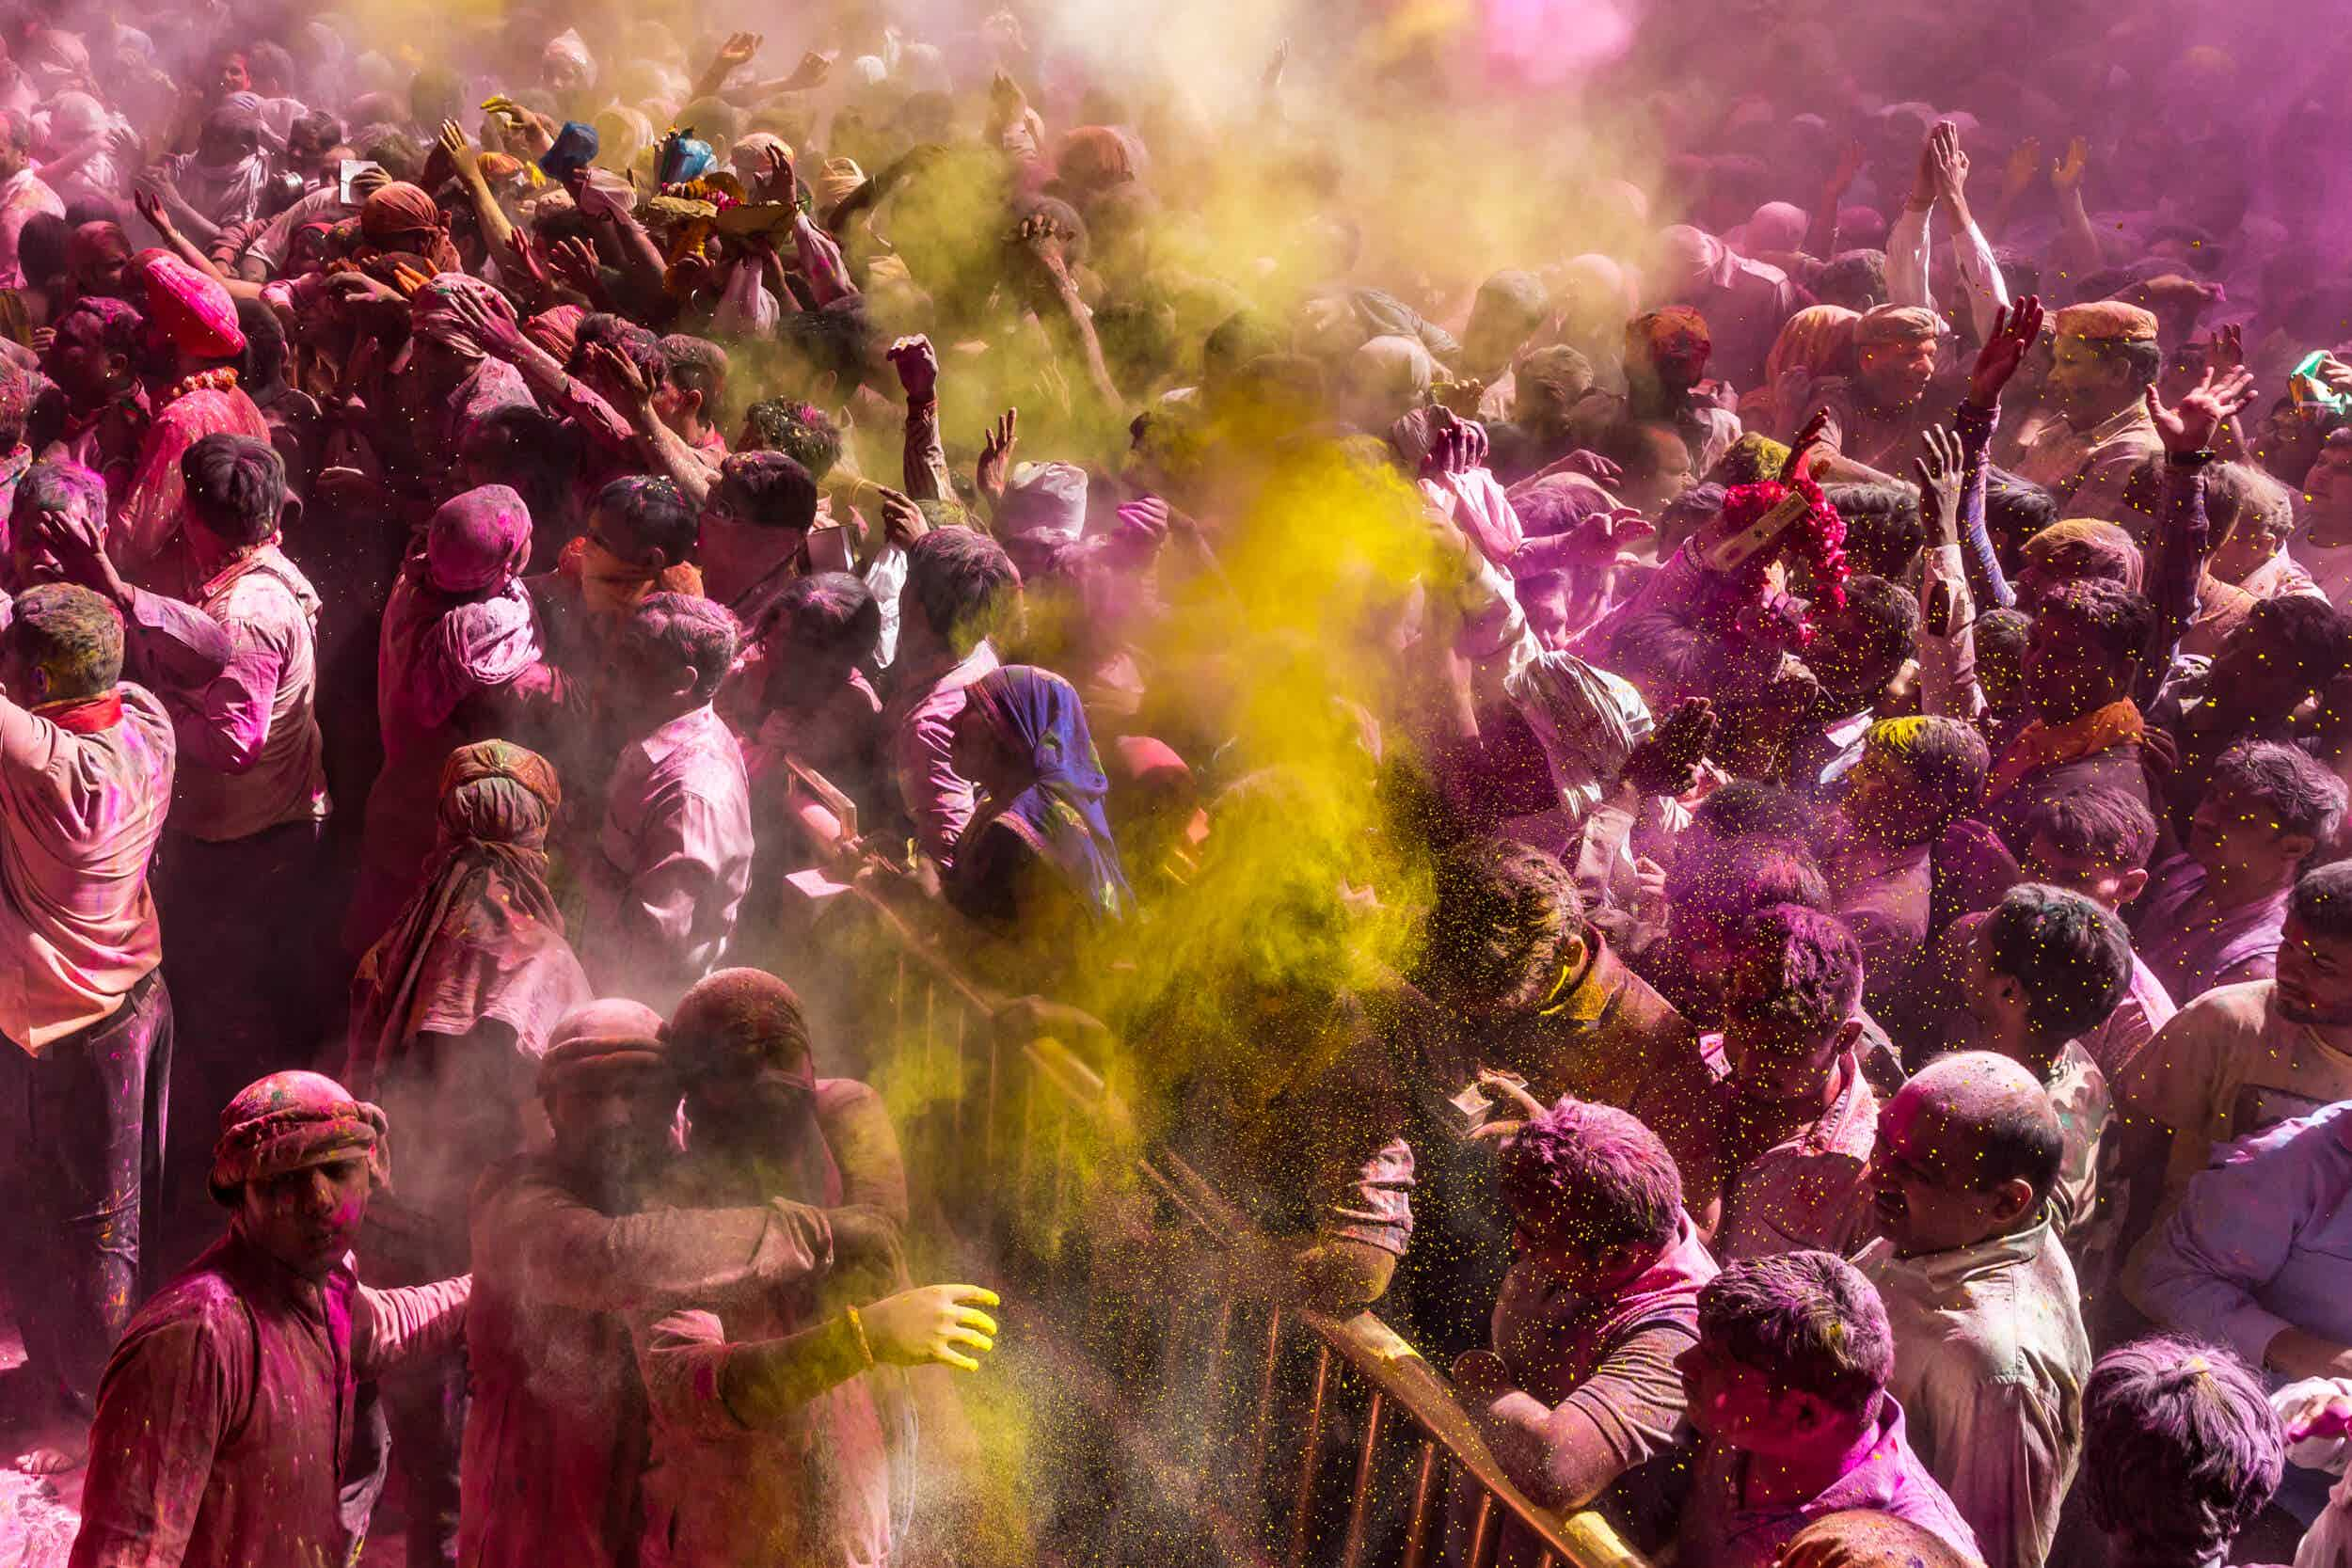 Surviving the Holi festival